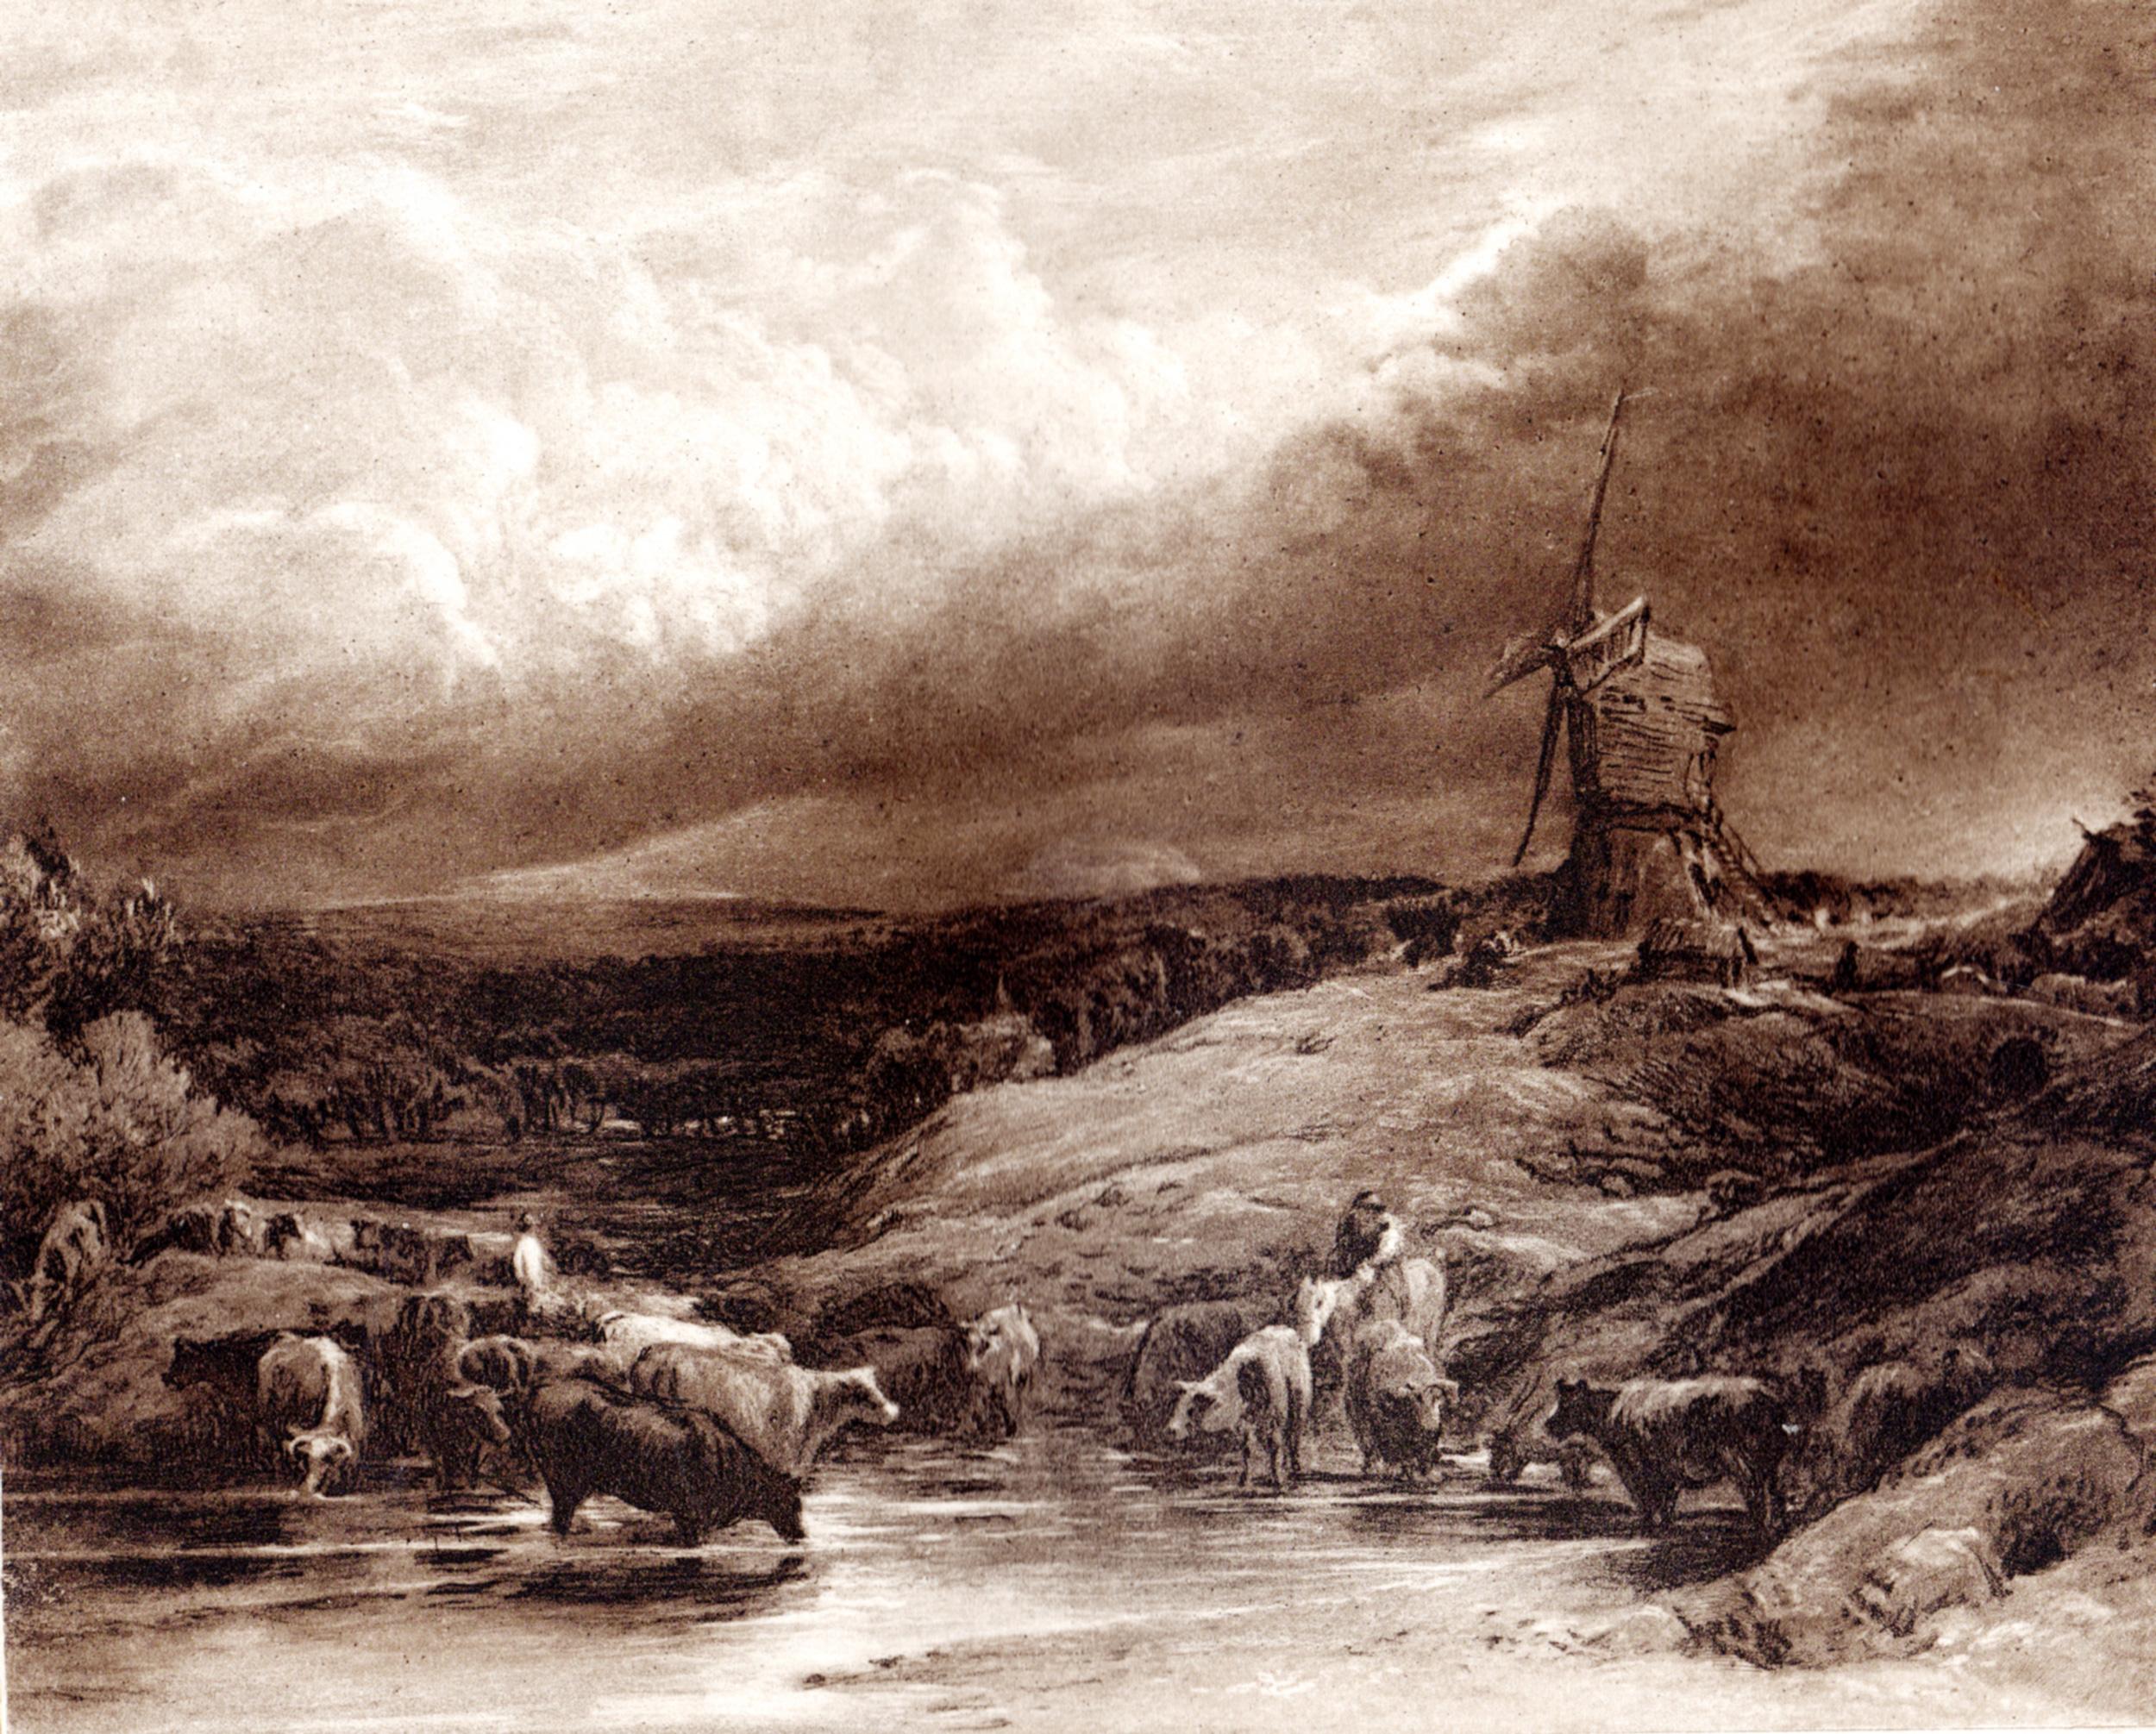 Hamerton, Philip Gilbert / various famous landscape artists